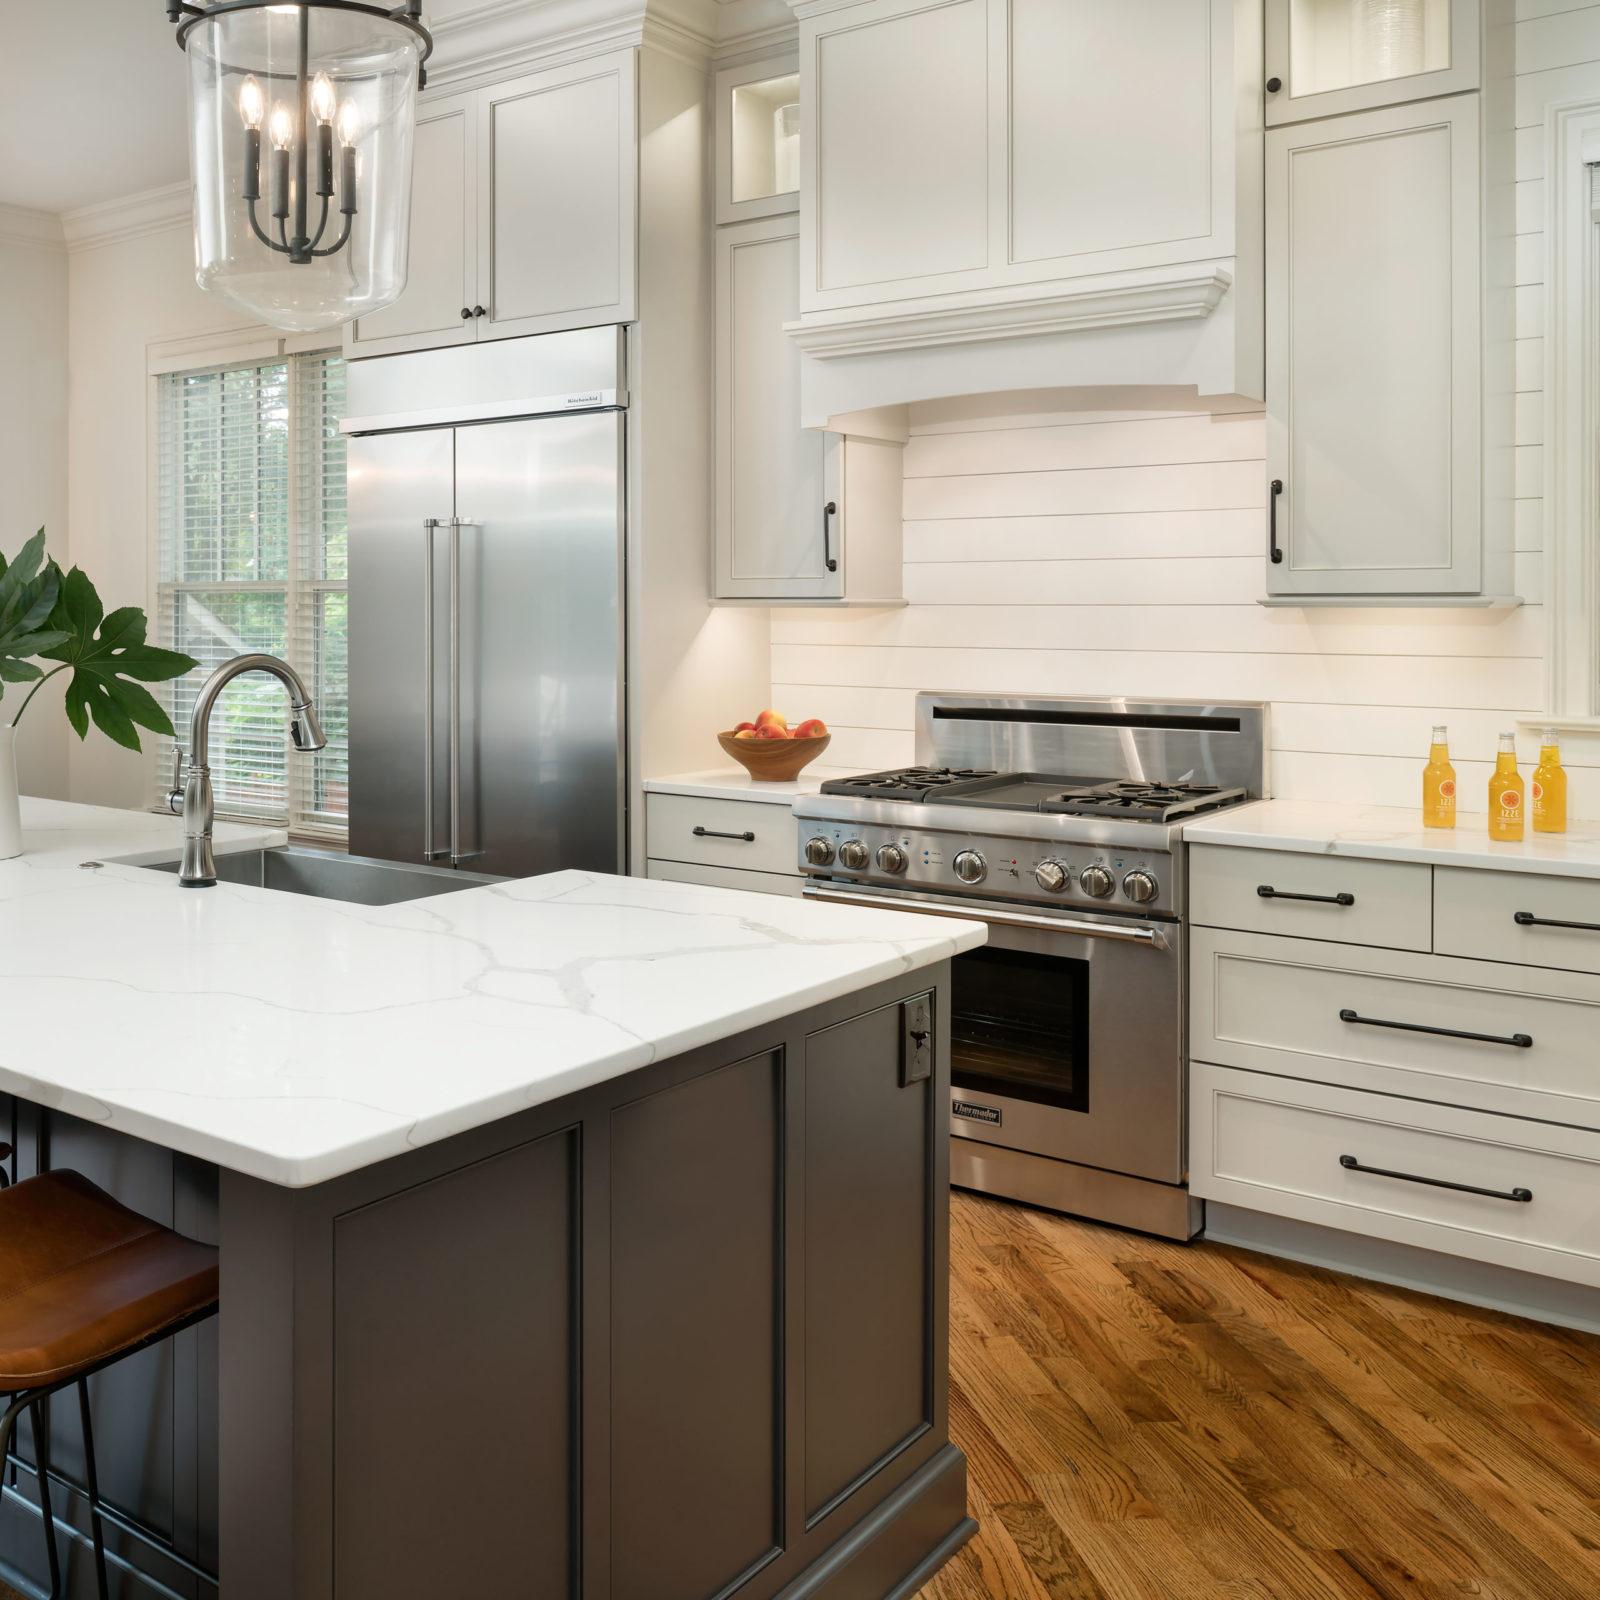 farmhouse-style-kitchen-dark-painted-island-quartz-countertop